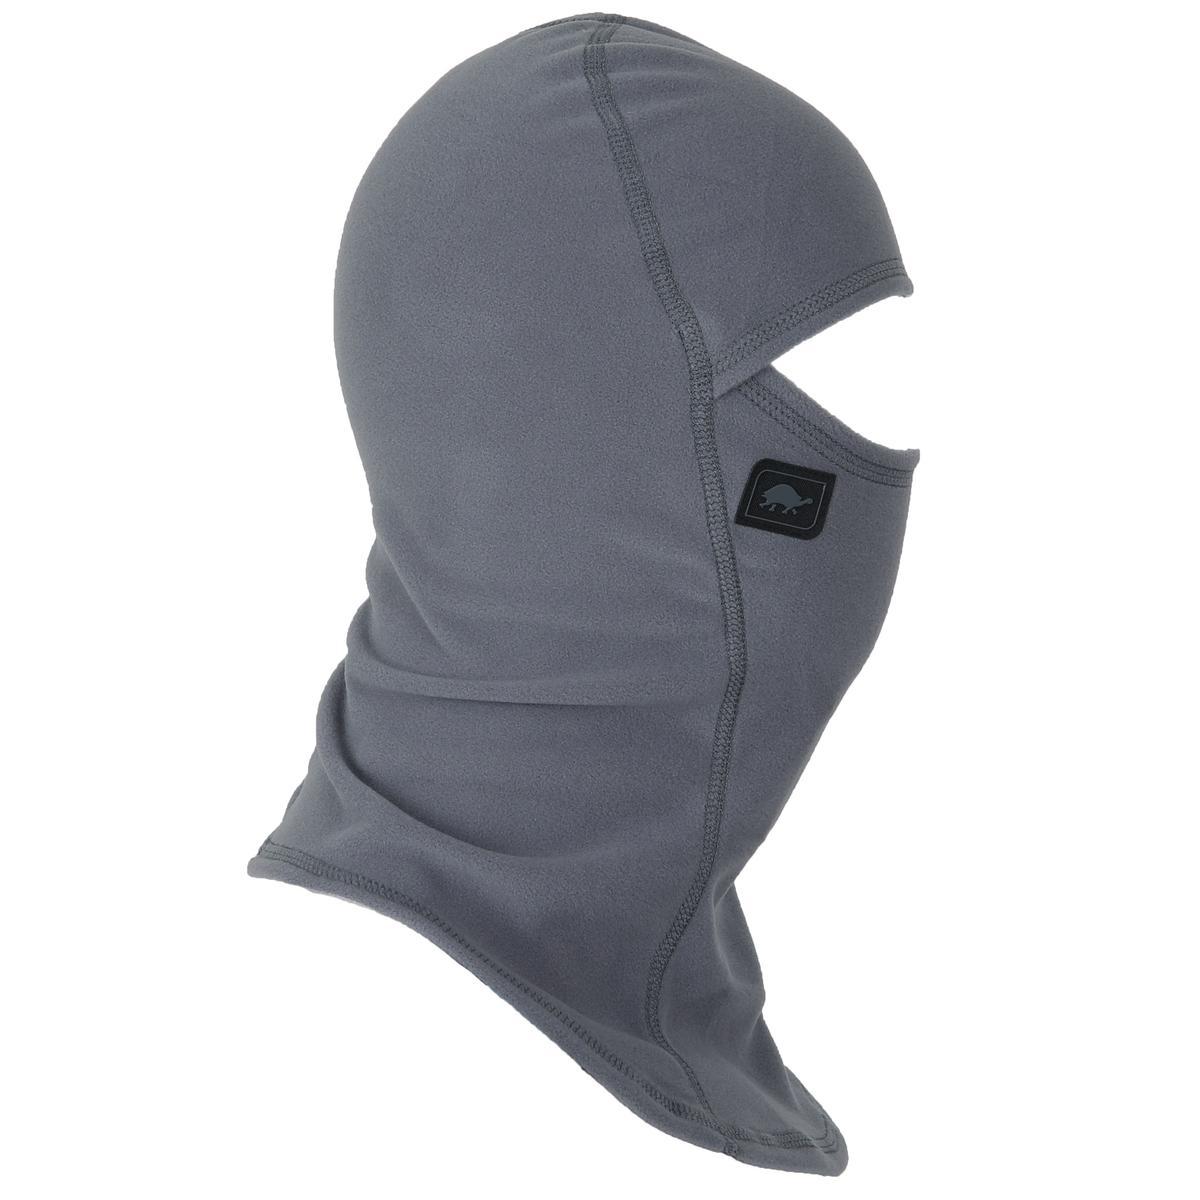 Turtle Fur Fleece Ninja Balaclava Face Mask Graphite